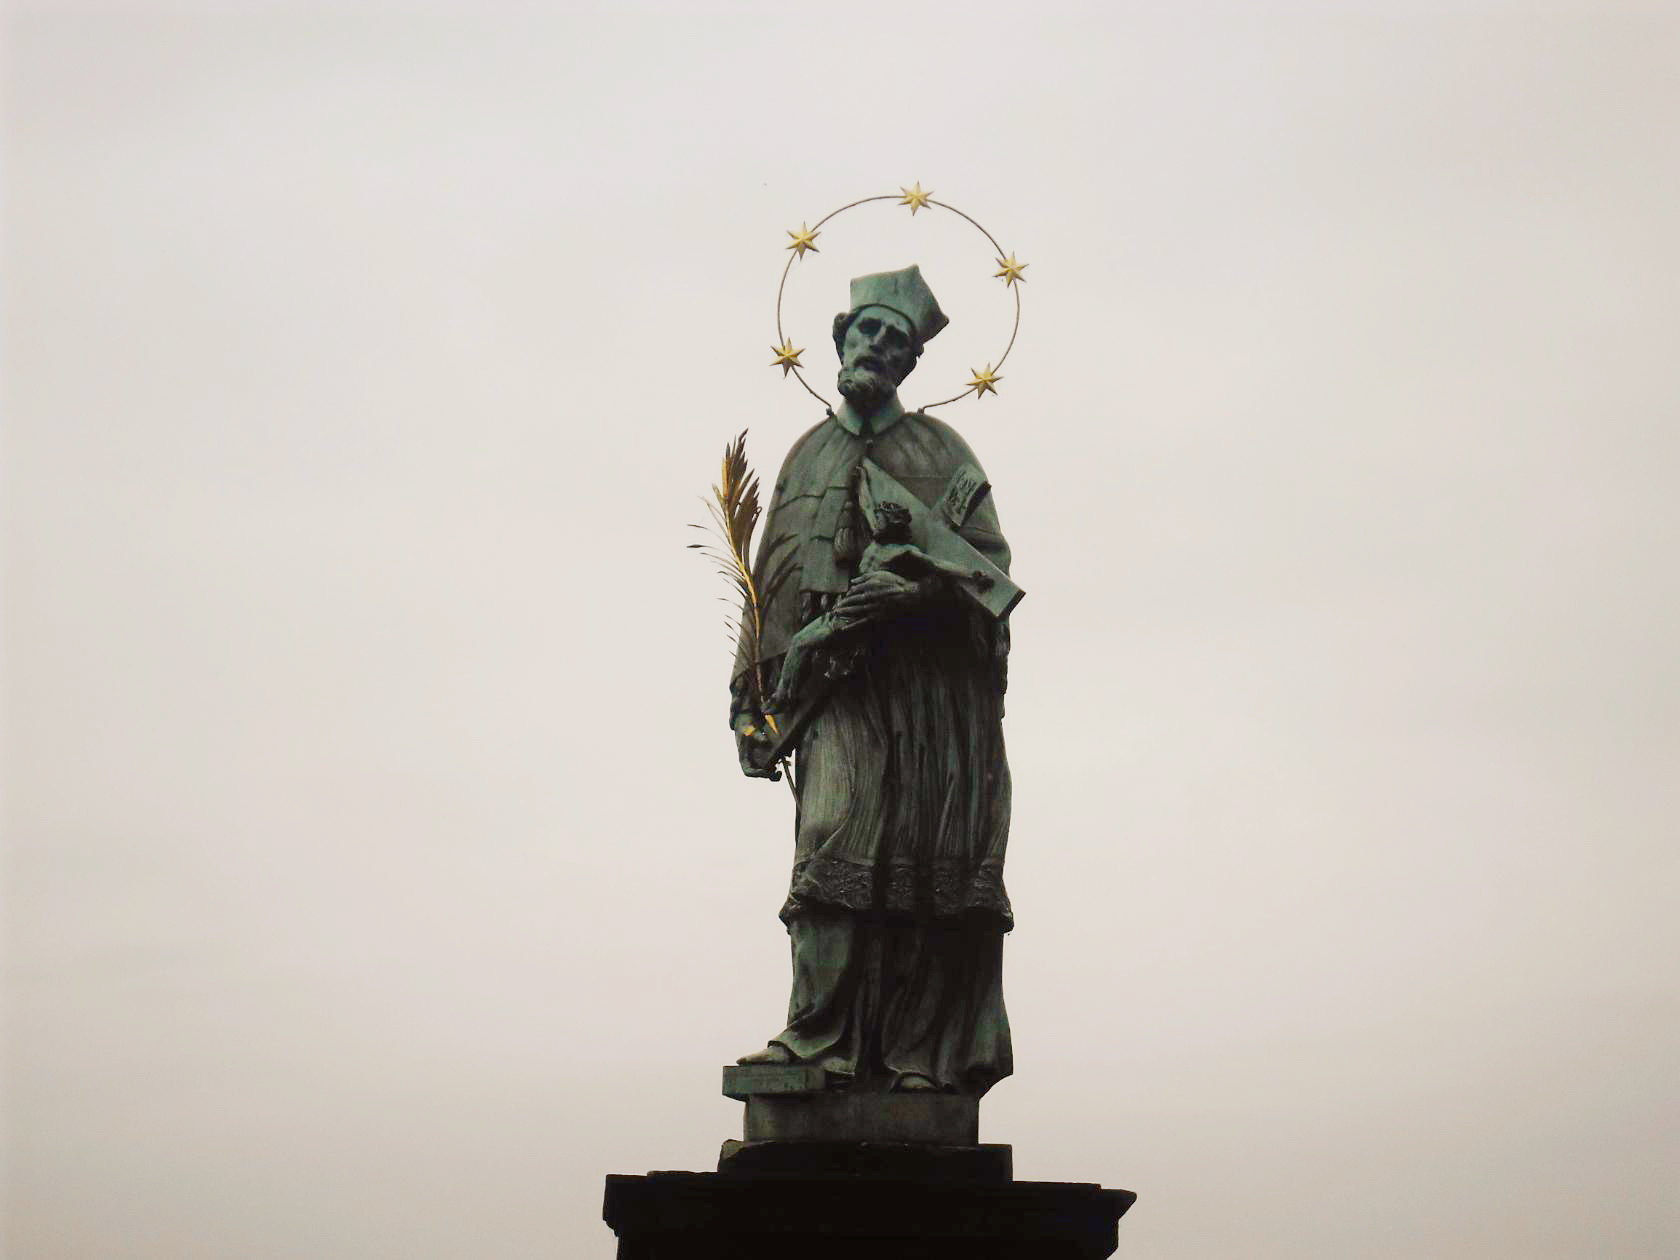 The Charles Bridge, Jan Nepomuk statue (Prague) Image